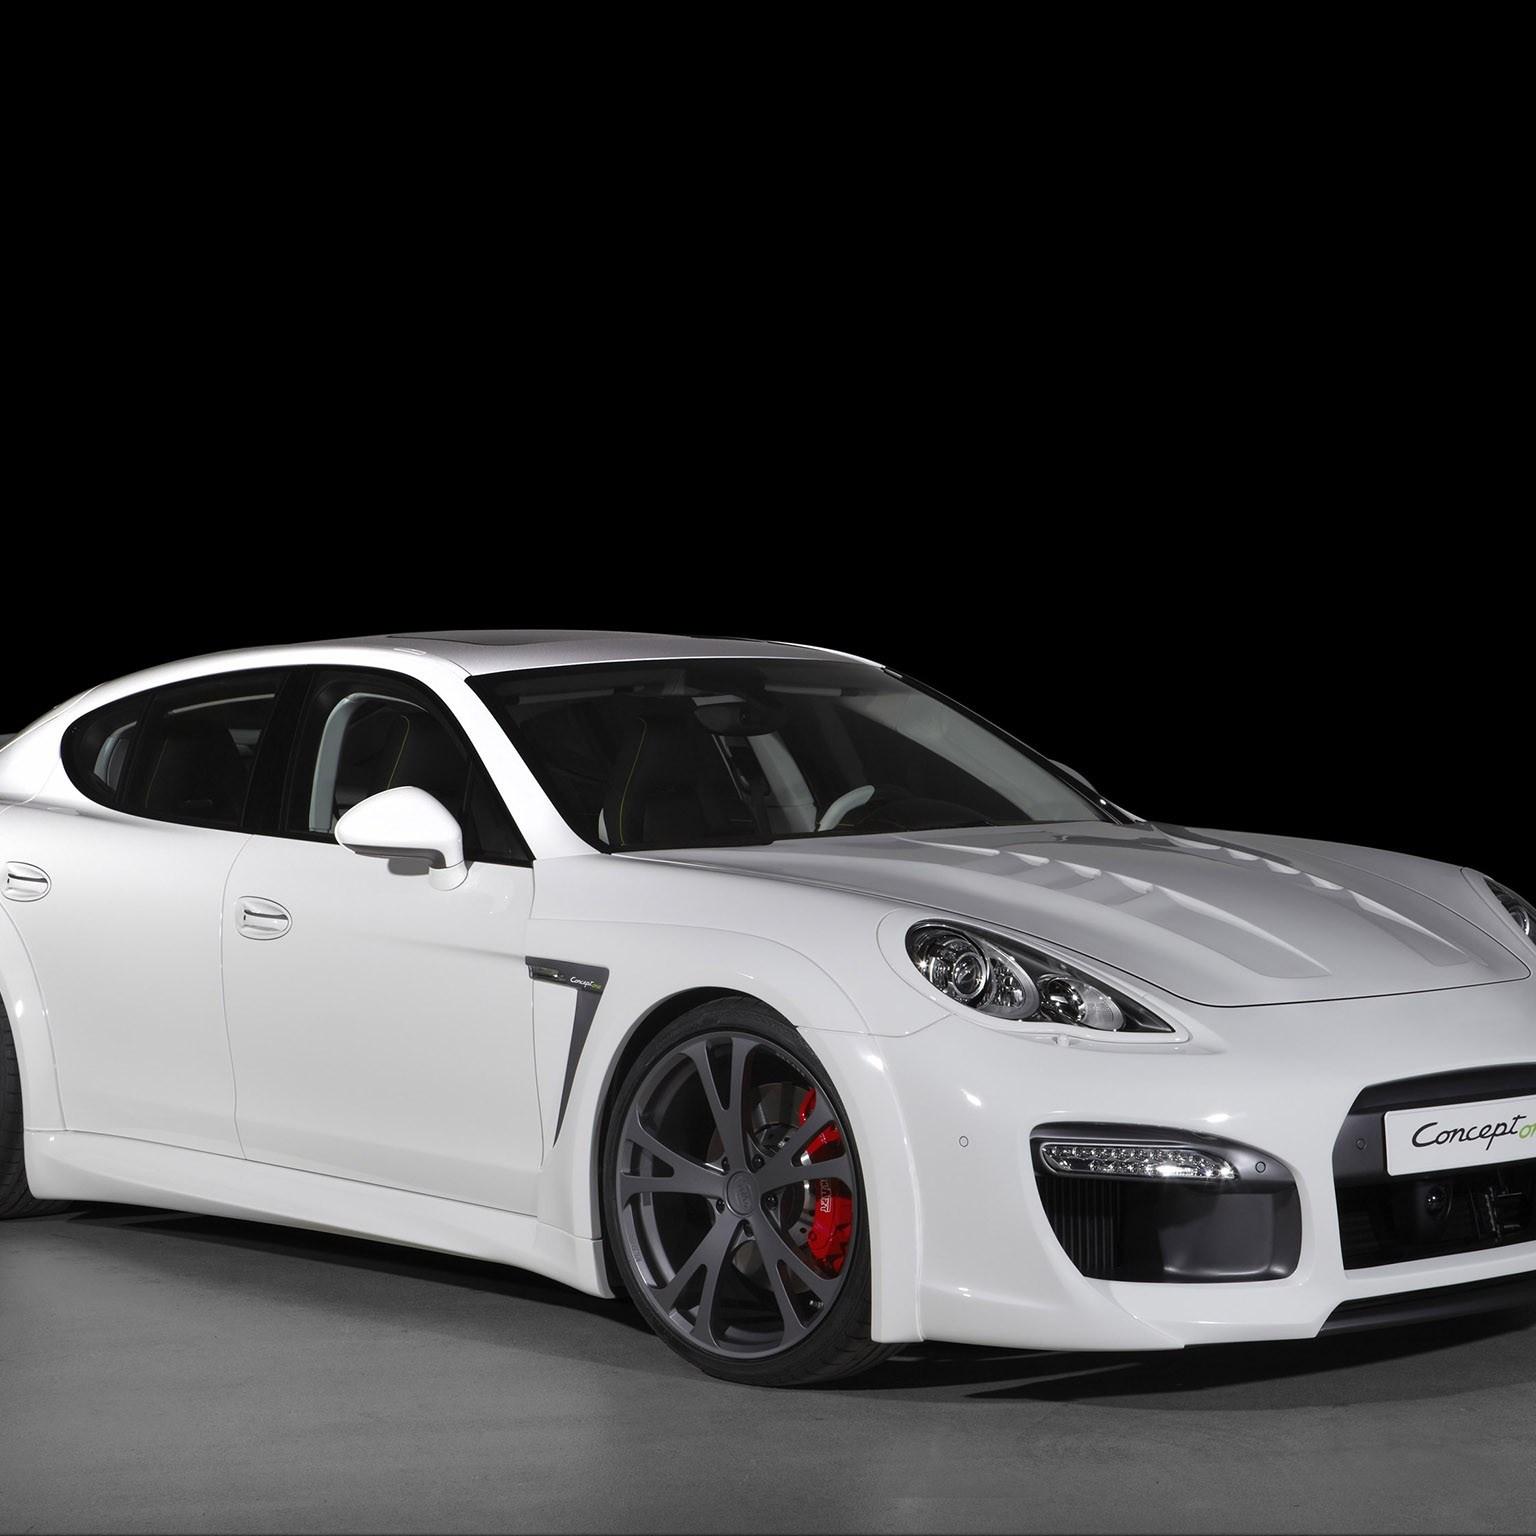 2010 Techart Porsche Panamera Concept One